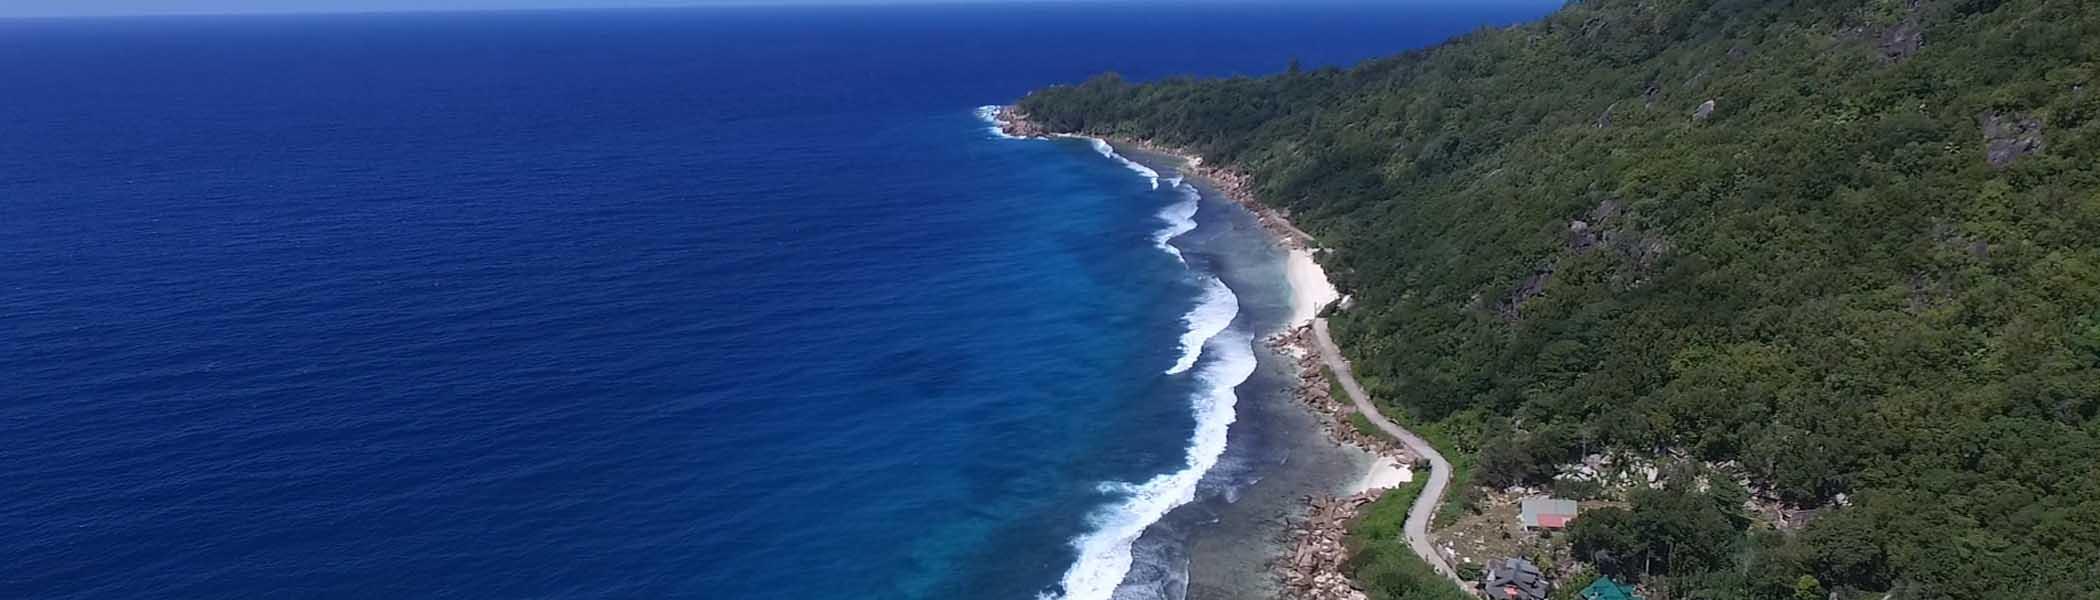 anse-fourmis, Beaches in Seychelles Islands